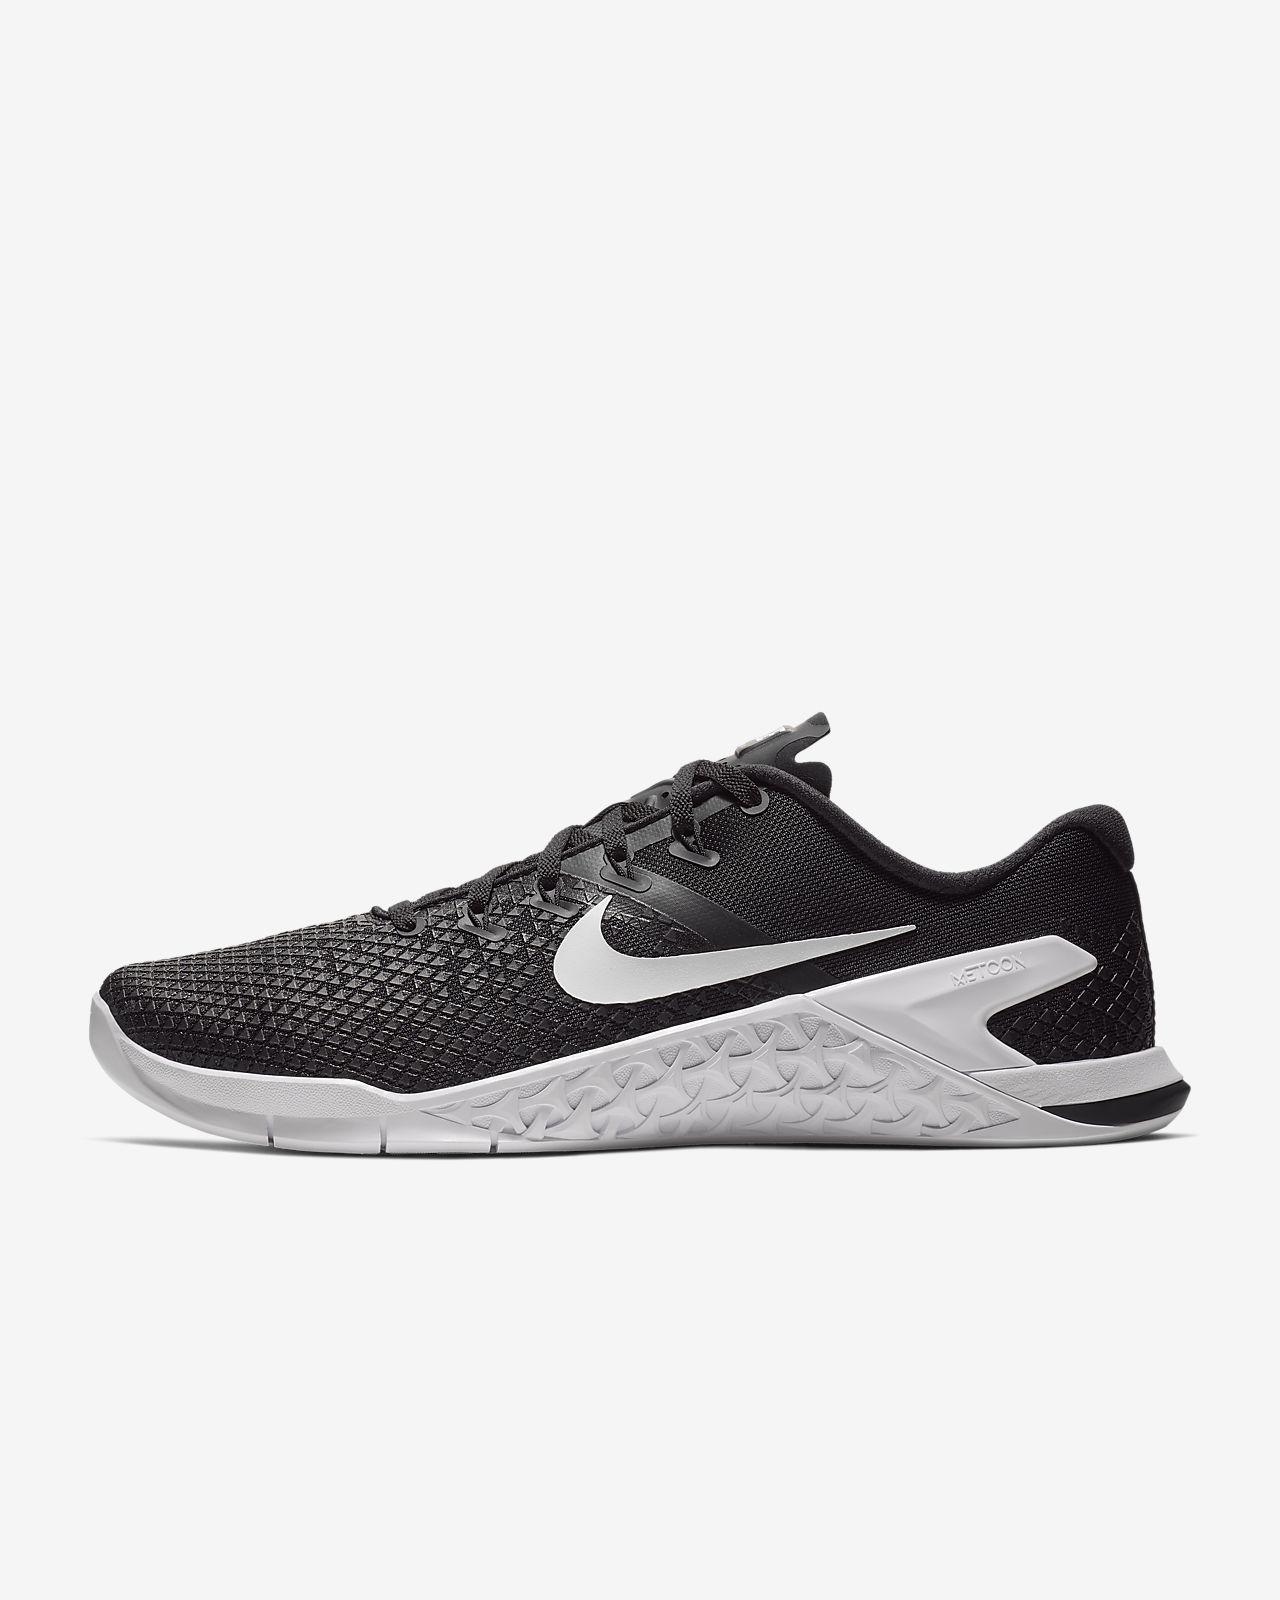 Nike Metcon 4 XD Sabatilles d'entrenament - Home